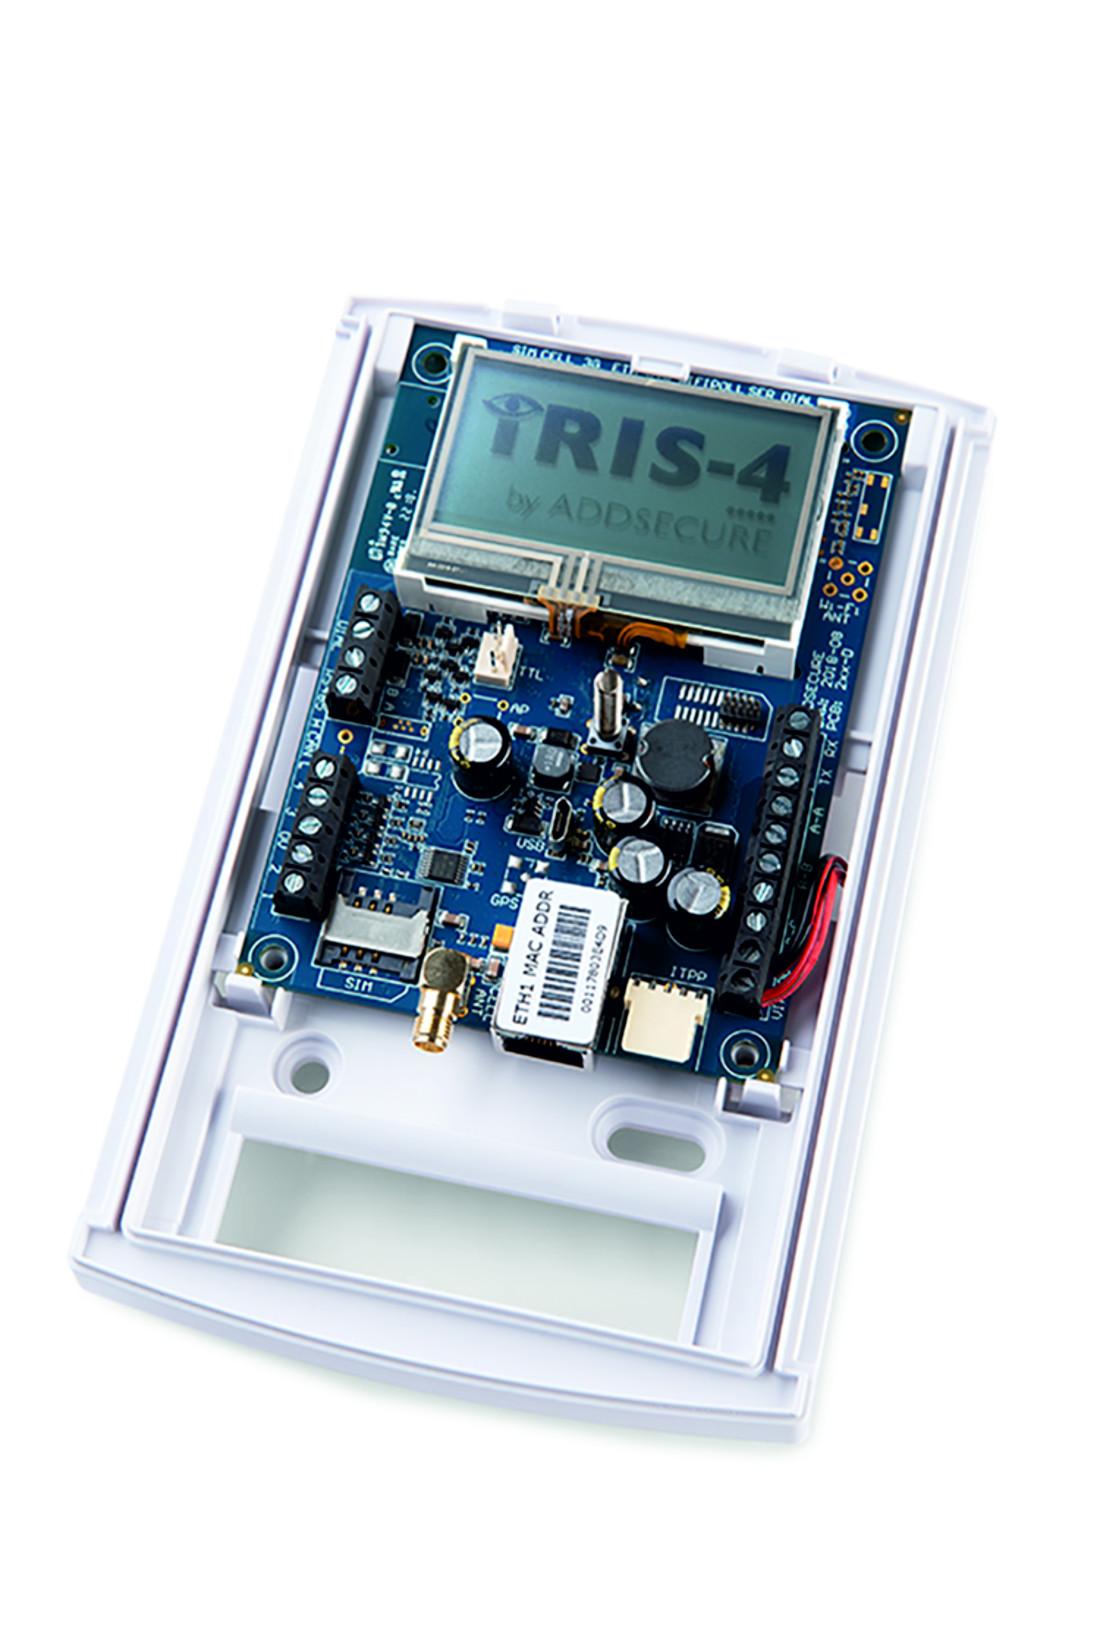 IRIS-4 240, ADDSECURE, Transmetteurs, Transmetteurs d'alarmes, Transmission, Intrusion, Entrée d'alarme : 4, Protocole de transmission : Contact ID, Robofon, Scancom Fast Format, SIA I, SIA II, SIA III, Sorties relais : 3, Réseau mobile : Penta band LTE (4G) 800/900/1800 MHz 2100/2600 MHz Dual band UMTS (3G) 900/2100 MHz Dual band GSM (2, IP Ethernet : RJ45 - Min. Cat 5 - 10/100 Base T,